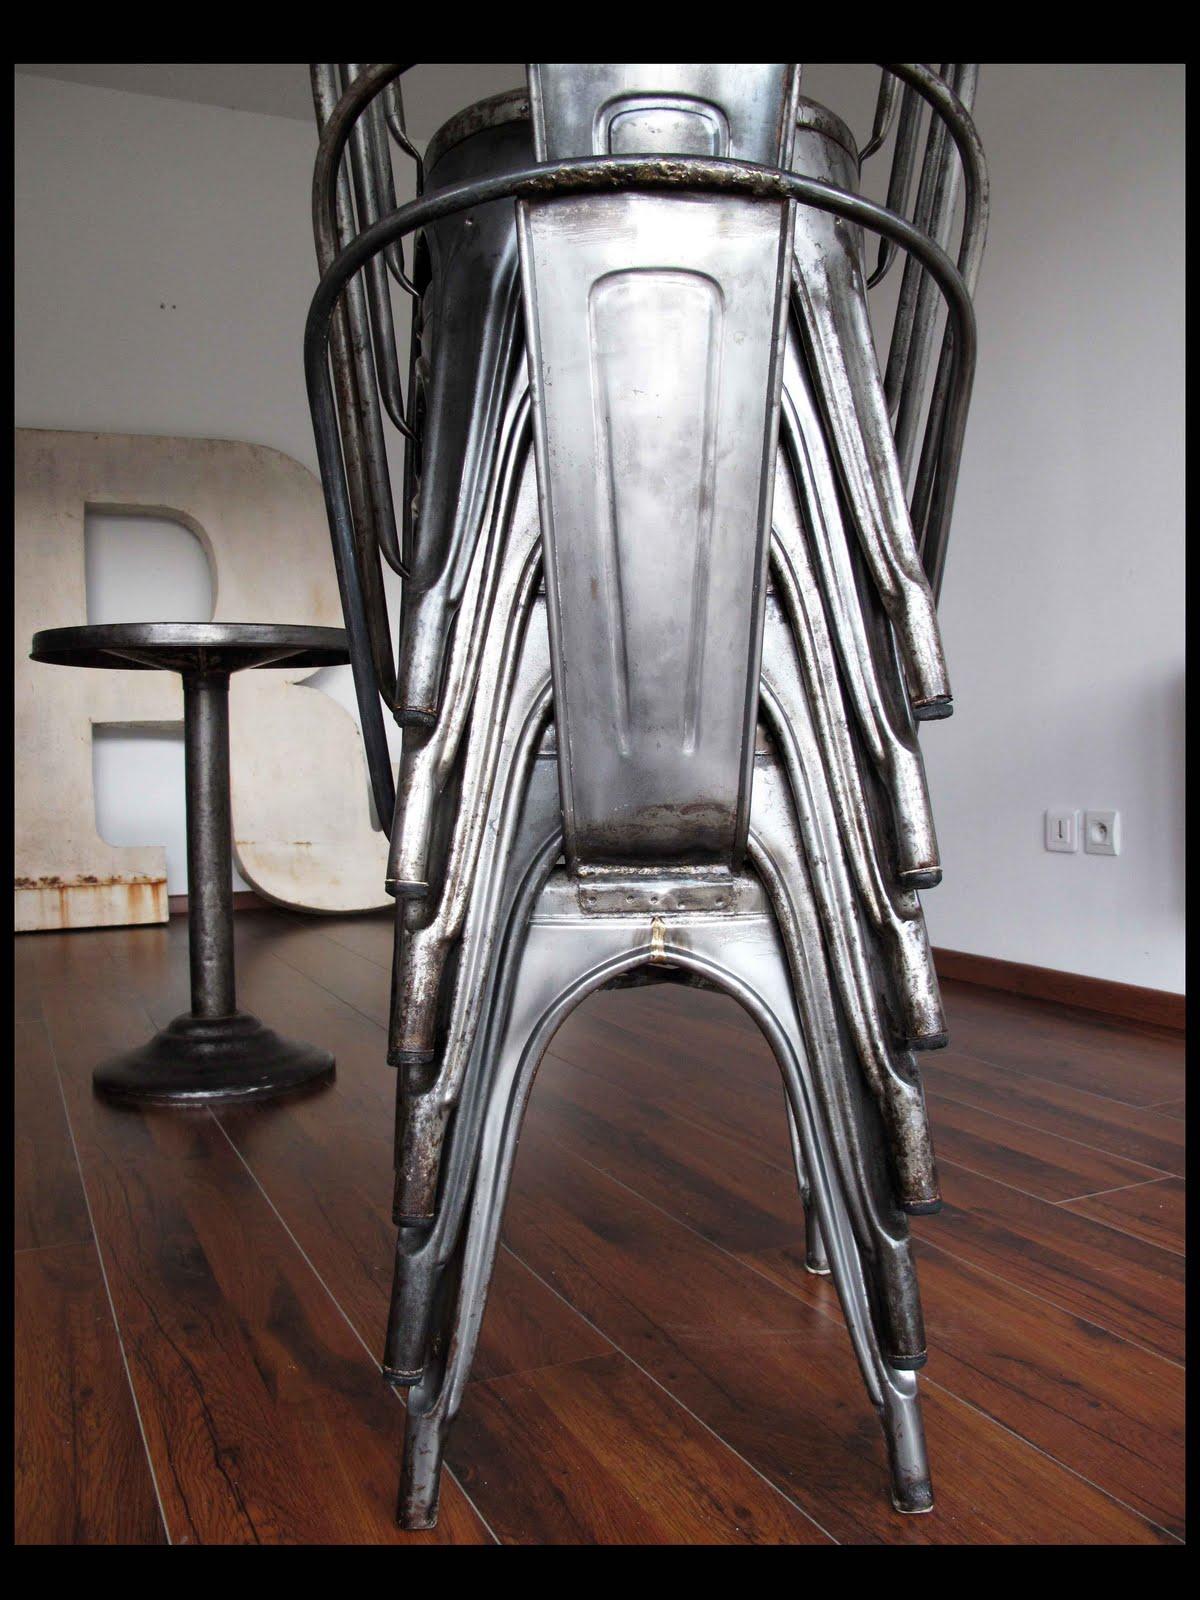 contact mobilierdesign20 deco metal chaises tolix a vintage decapees. Black Bedroom Furniture Sets. Home Design Ideas